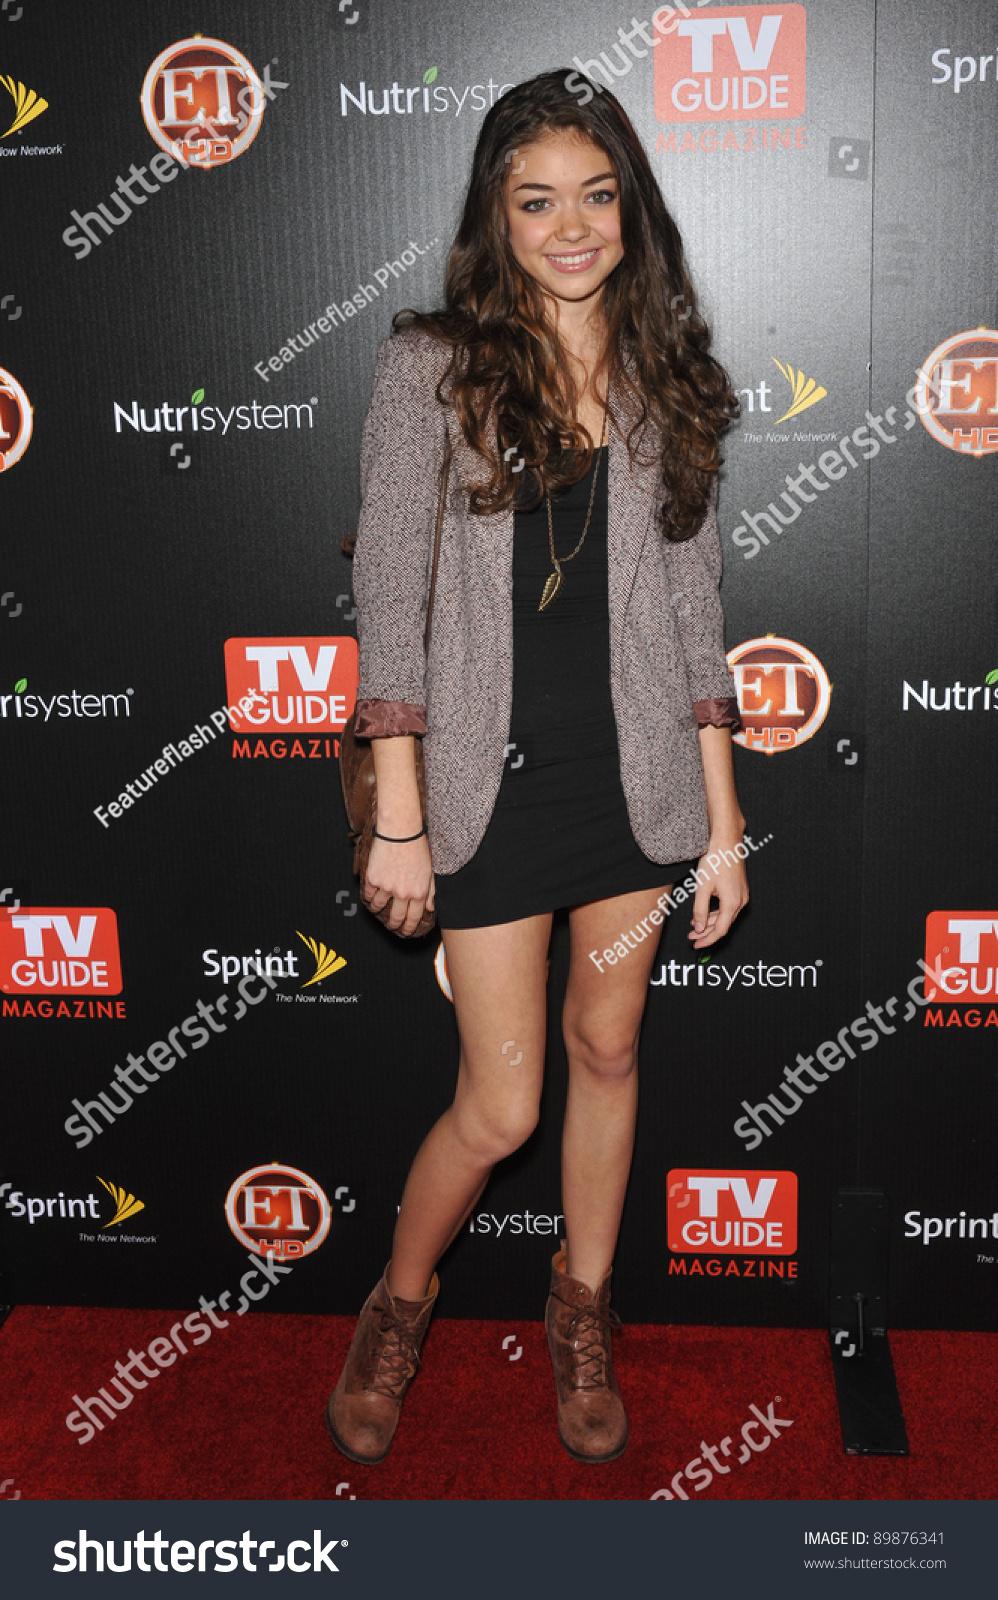 Sarah Hyland Tv Guide Magazines Hot Stock Photo 89876341 ...